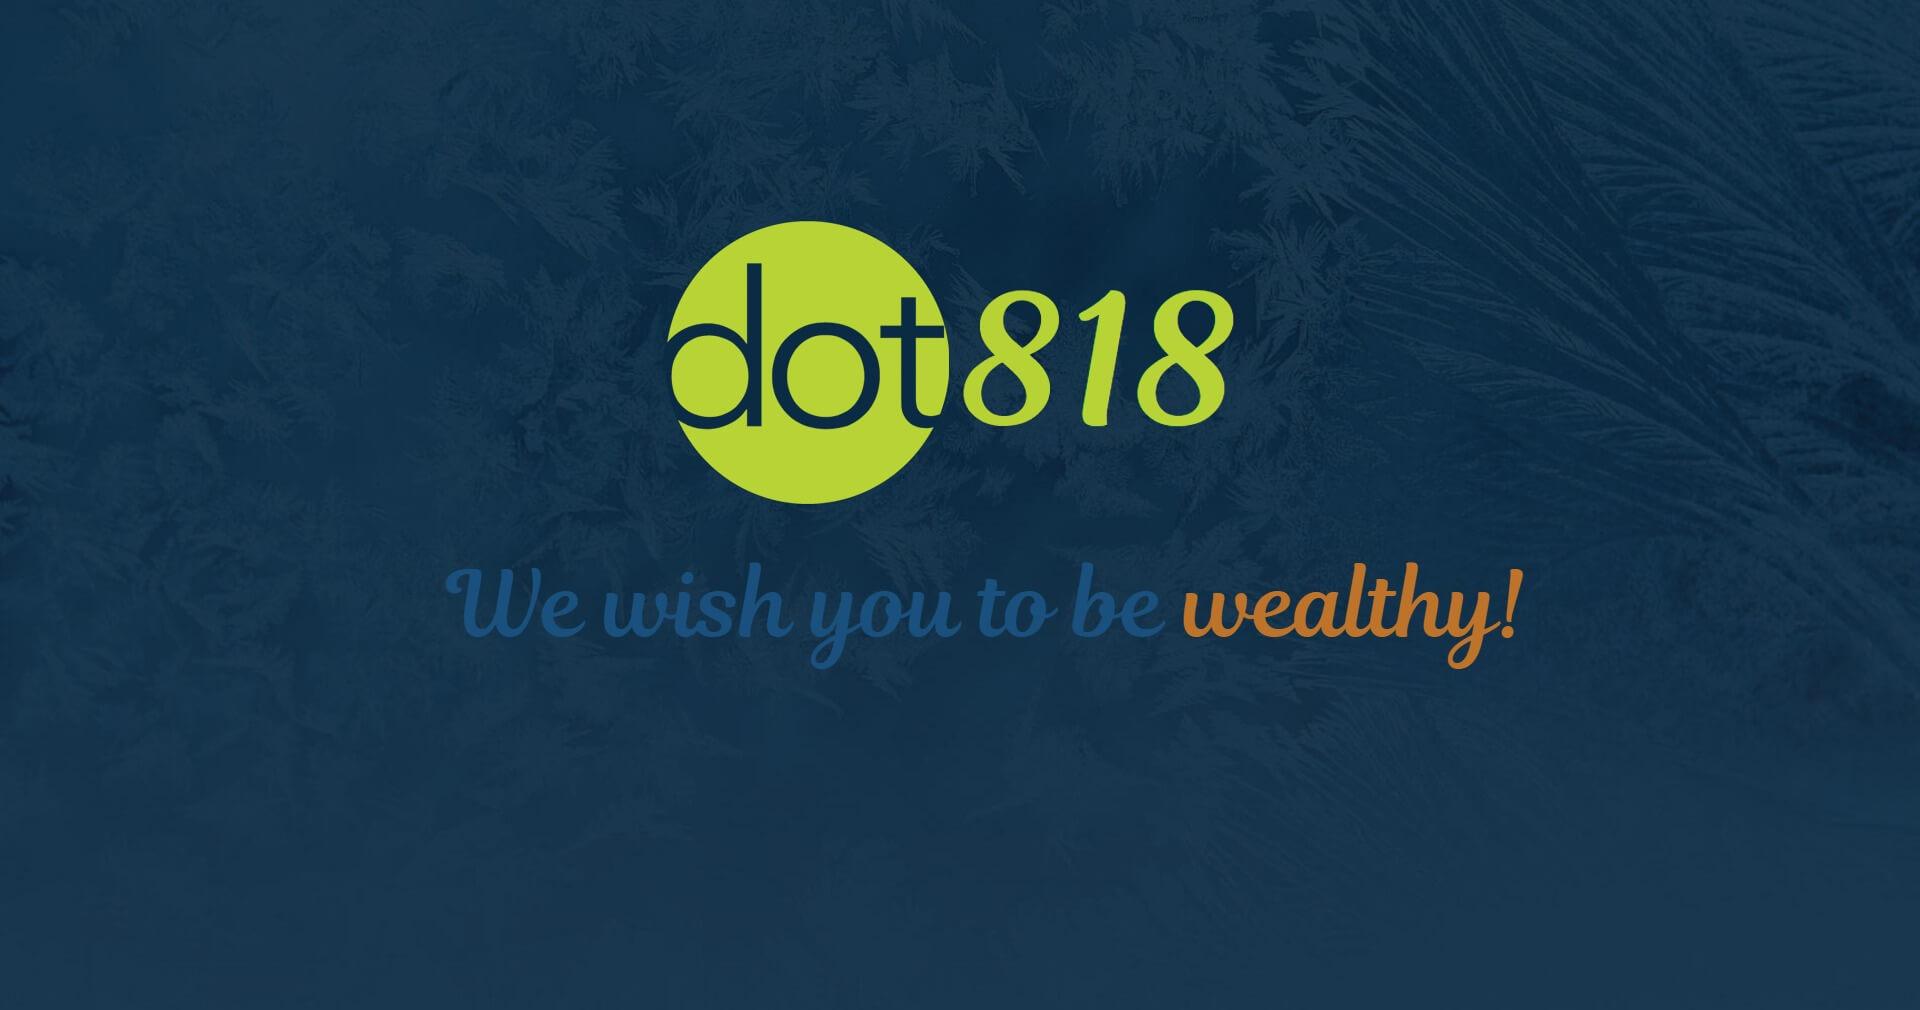 screencapture-dot818-themes-merry-christmas-2018-html-2018-10-22-16_17_18